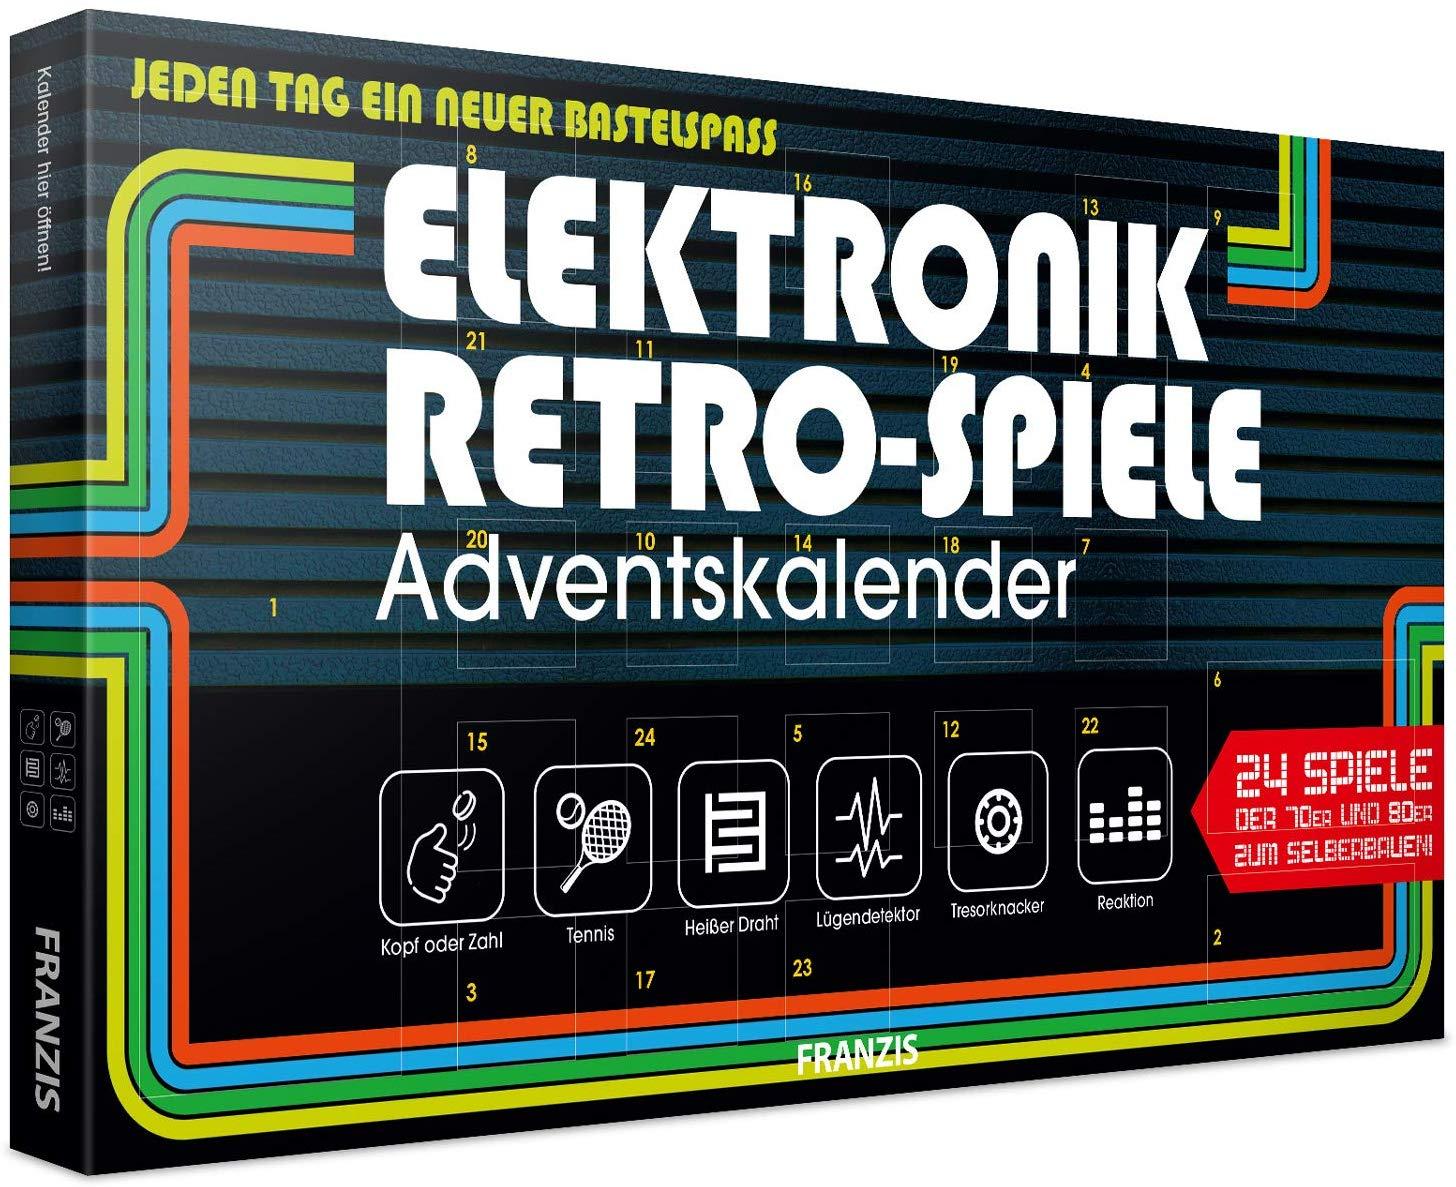 Franzis Retro Elektronik Adventskalender amazon